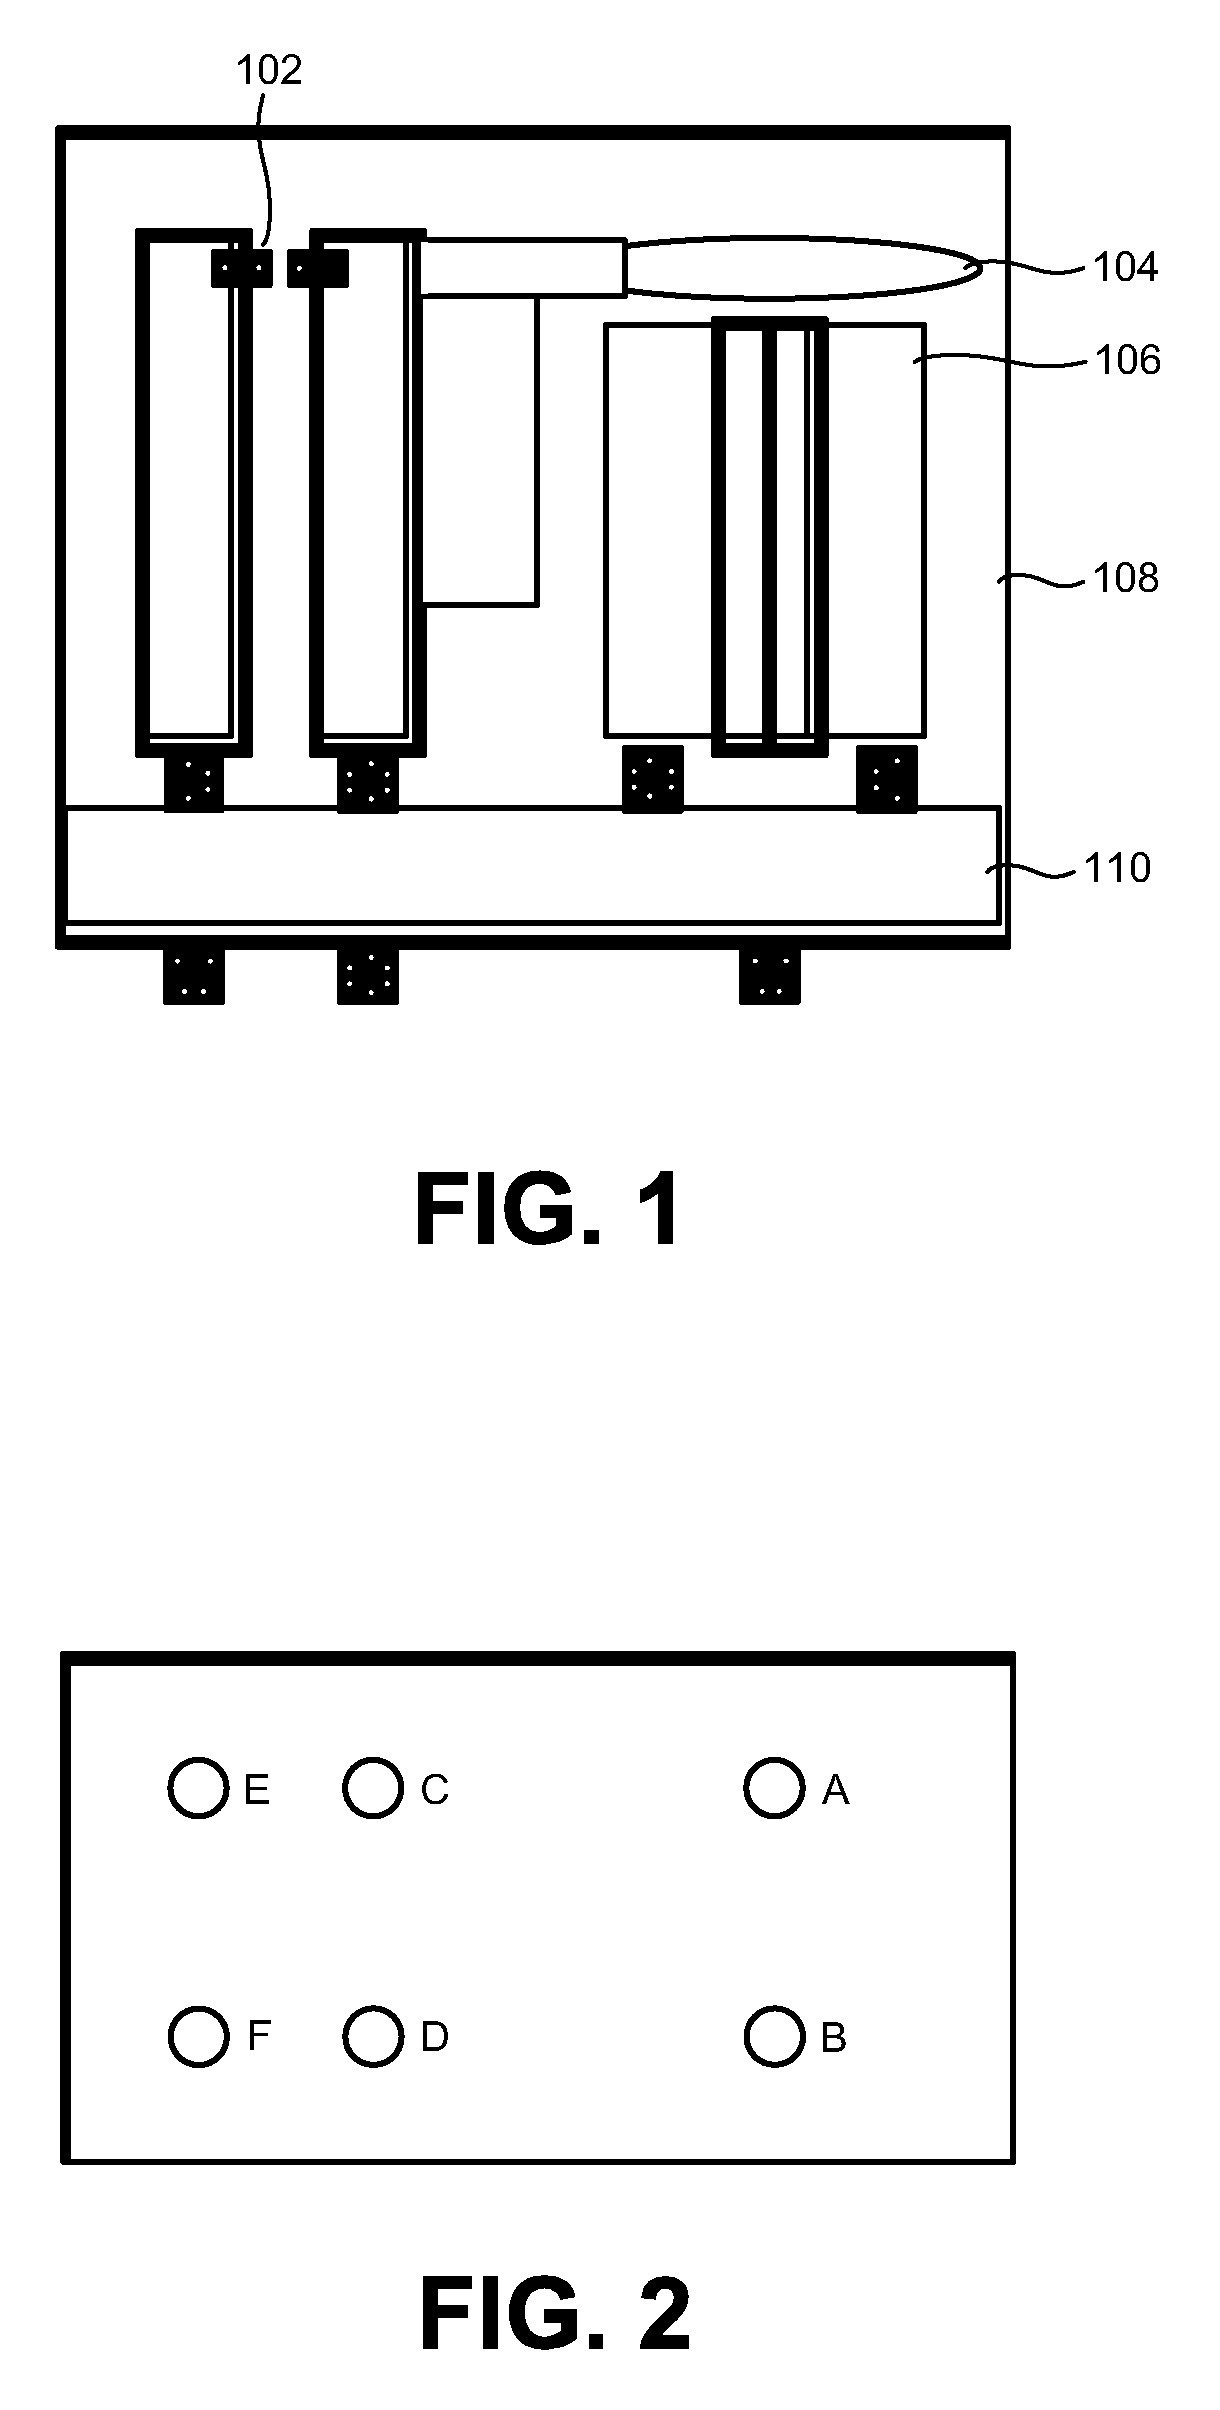 hight resolution of 120 volt relay wiring diagram relay base wiring diagram valid wiring diagram relays 12 volt